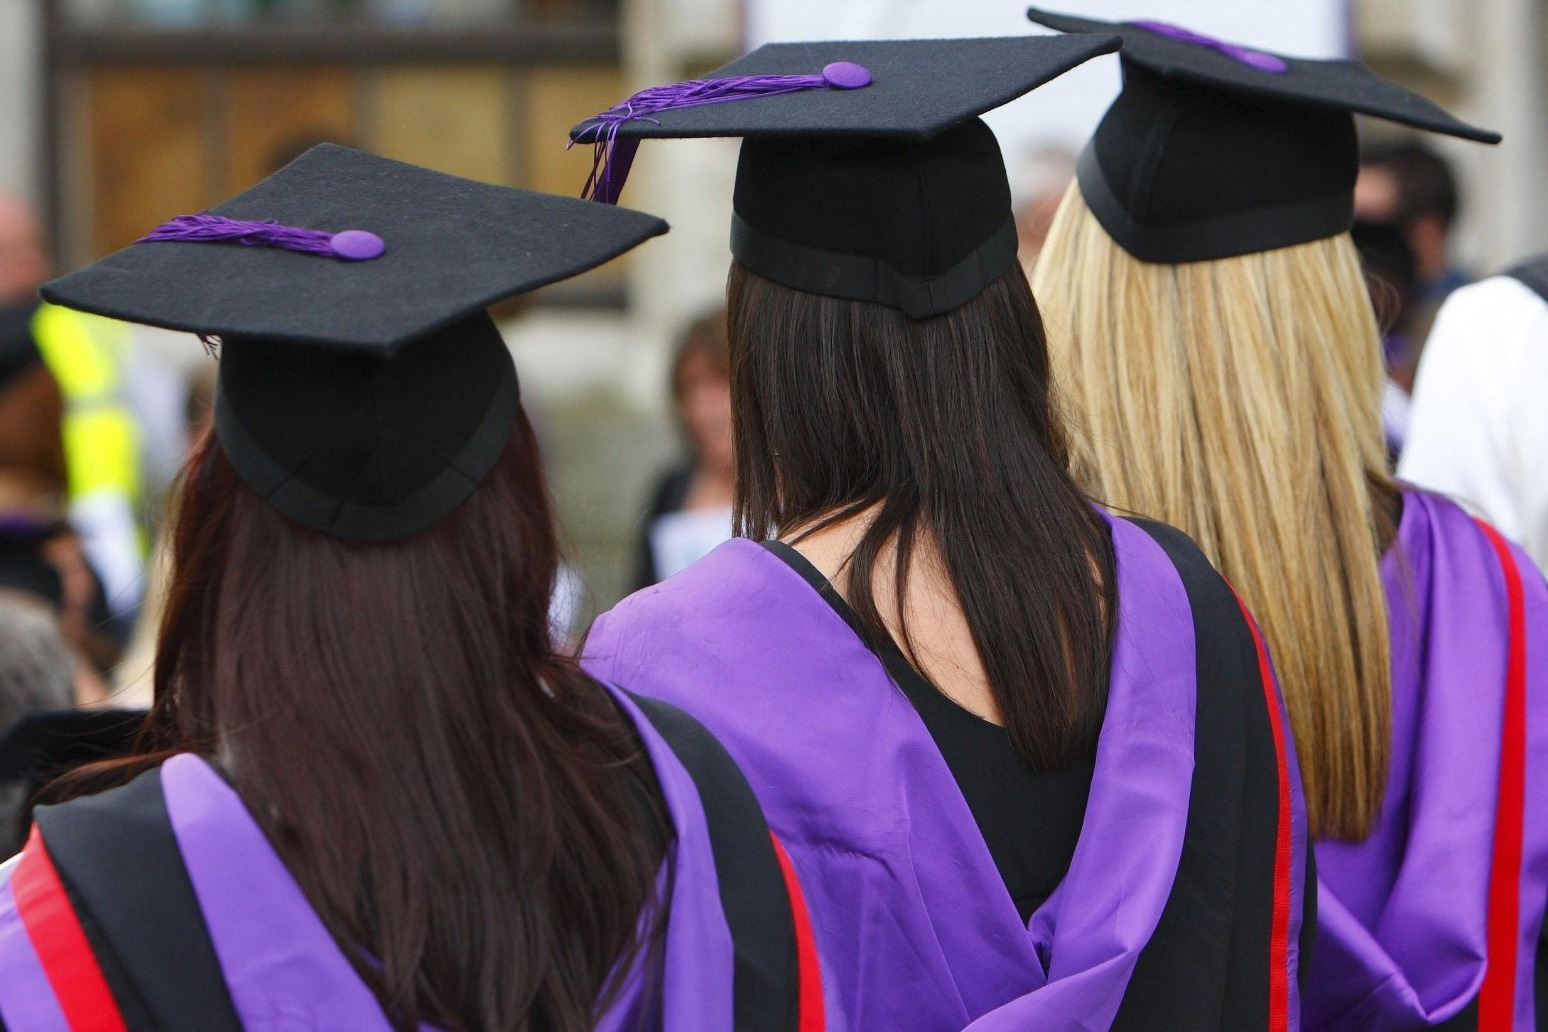 Academic freedom in danger at universities as staff self-censor, report warns